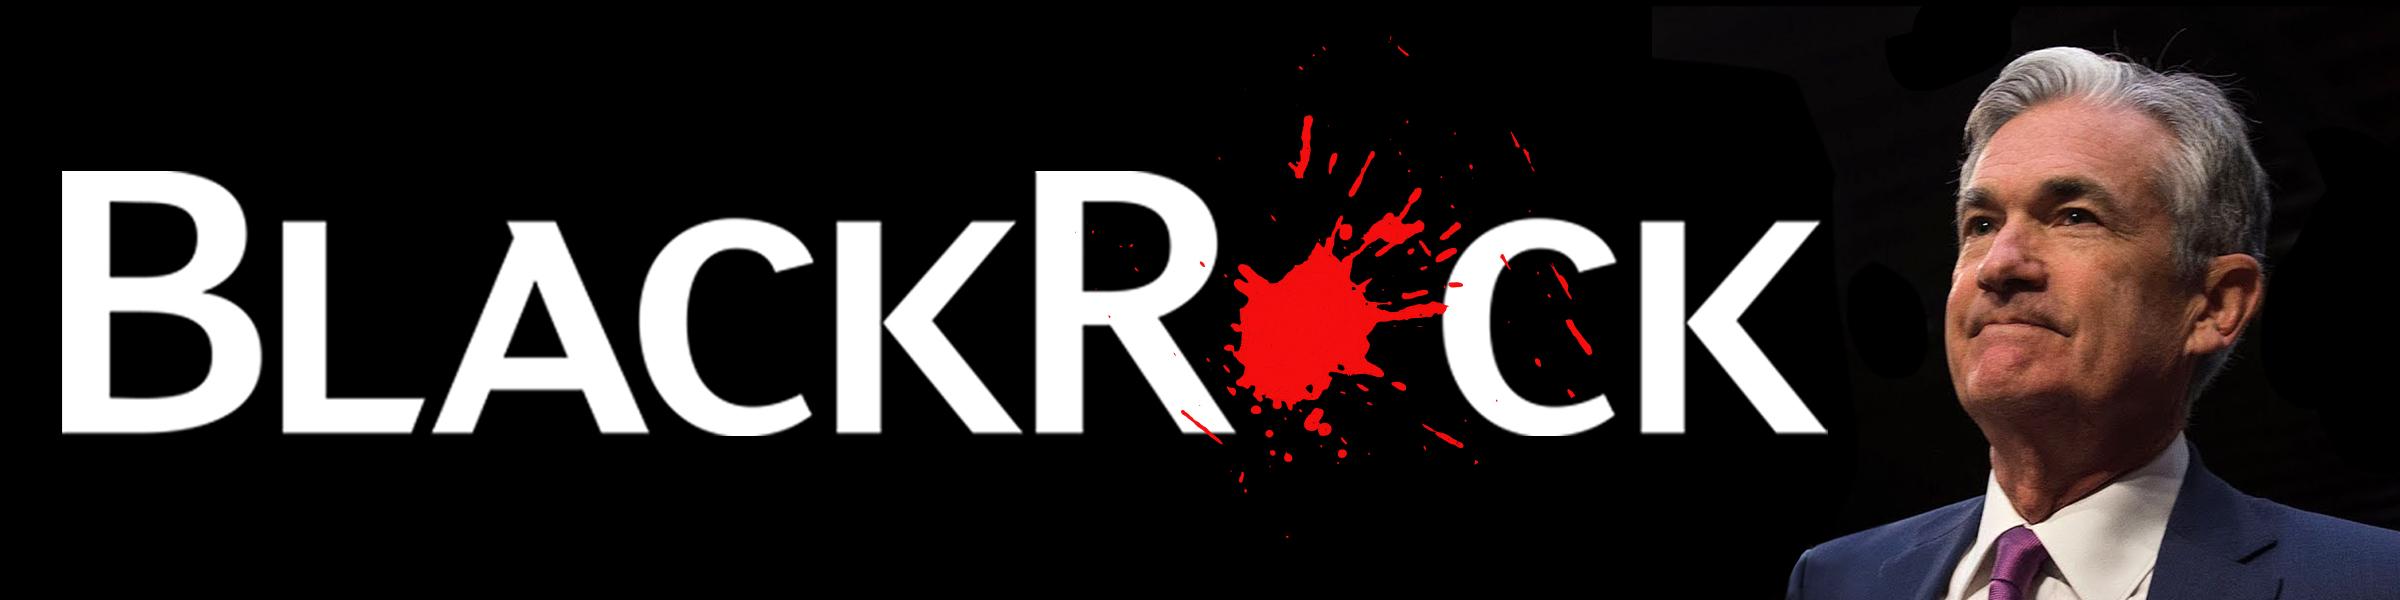 No Bailout for BlackRock!